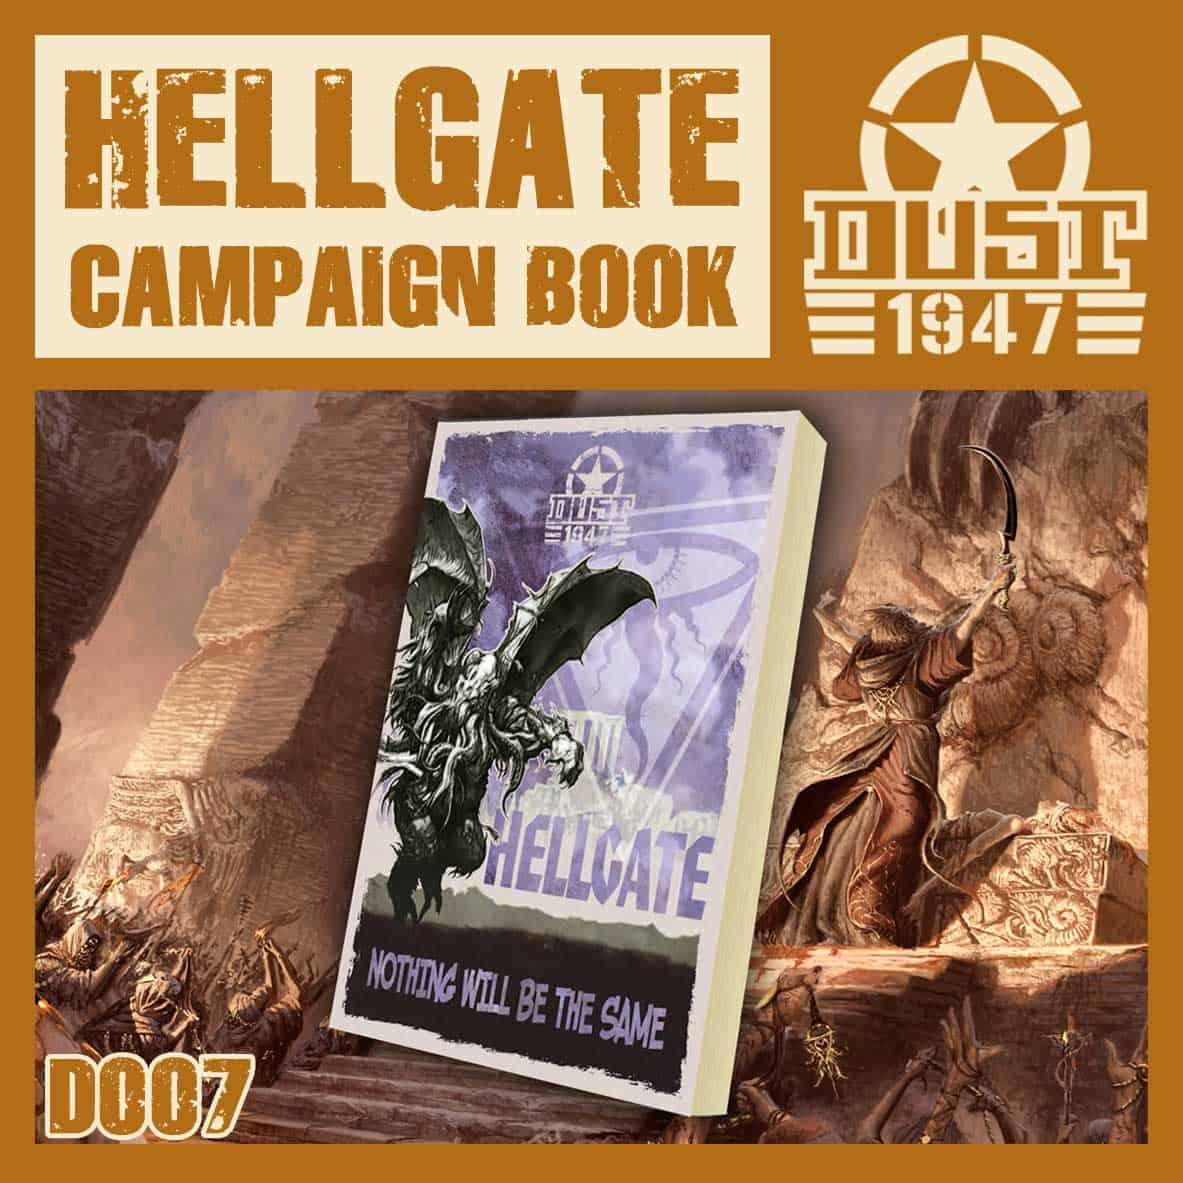 Operacja Hellgate